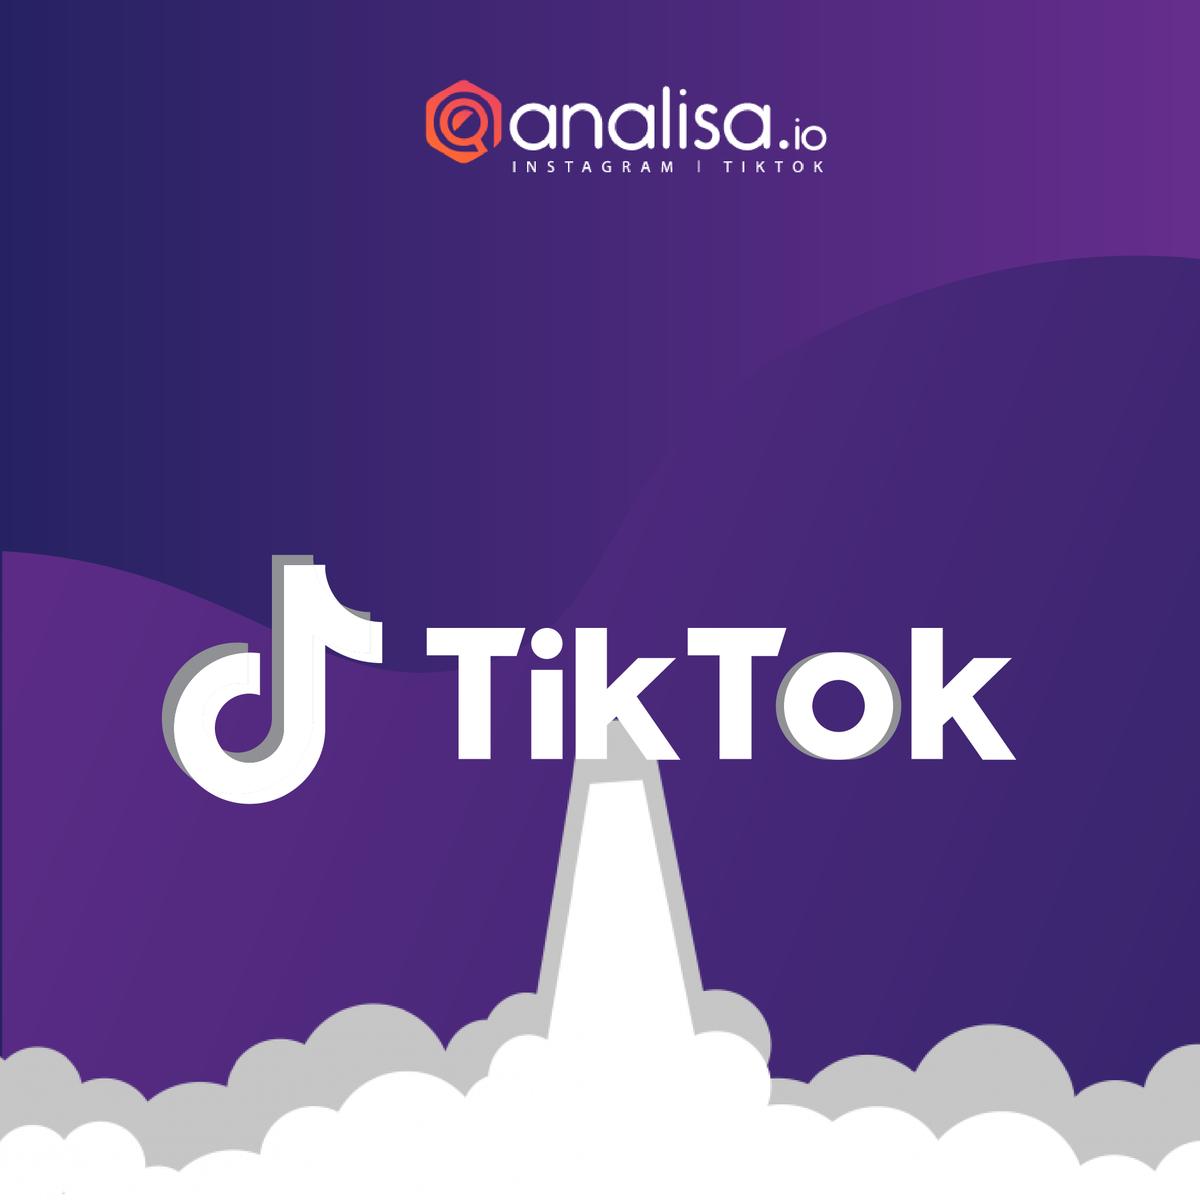 TikTok Downloads Surpass 2 Billion